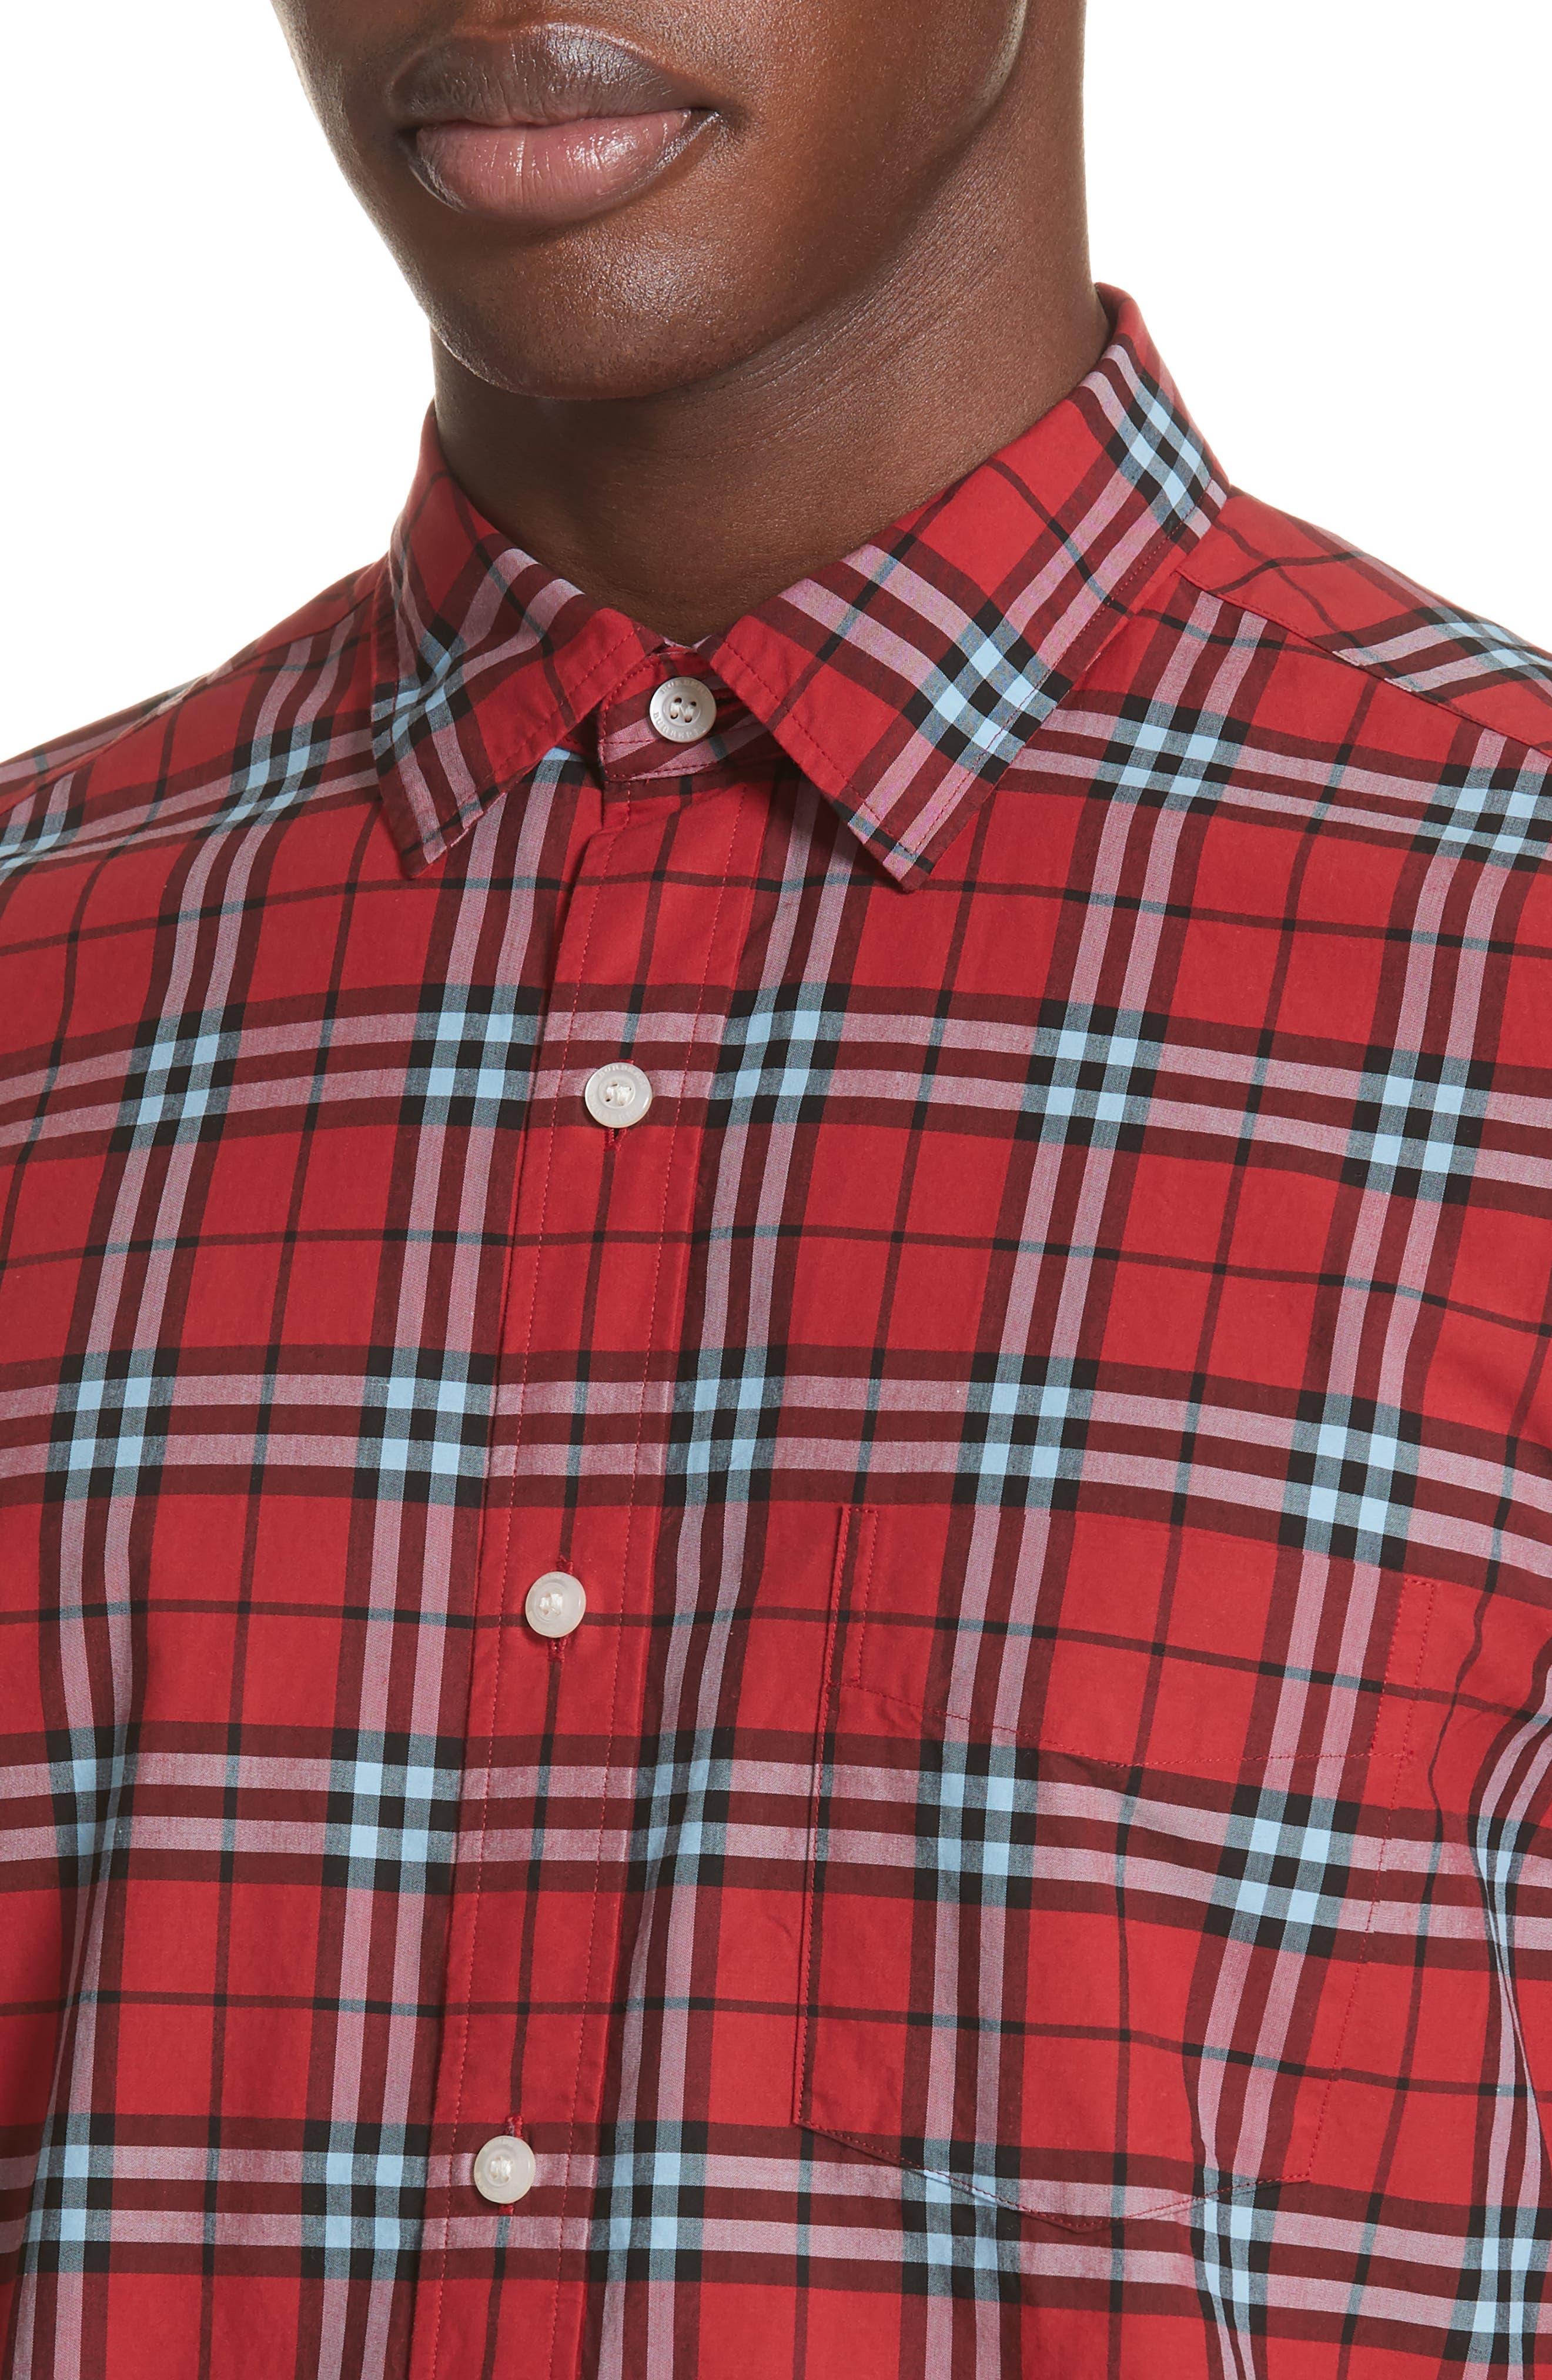 Alexander Check Sport Shirt,                             Alternate thumbnail 2, color,                             BRIGHT RED